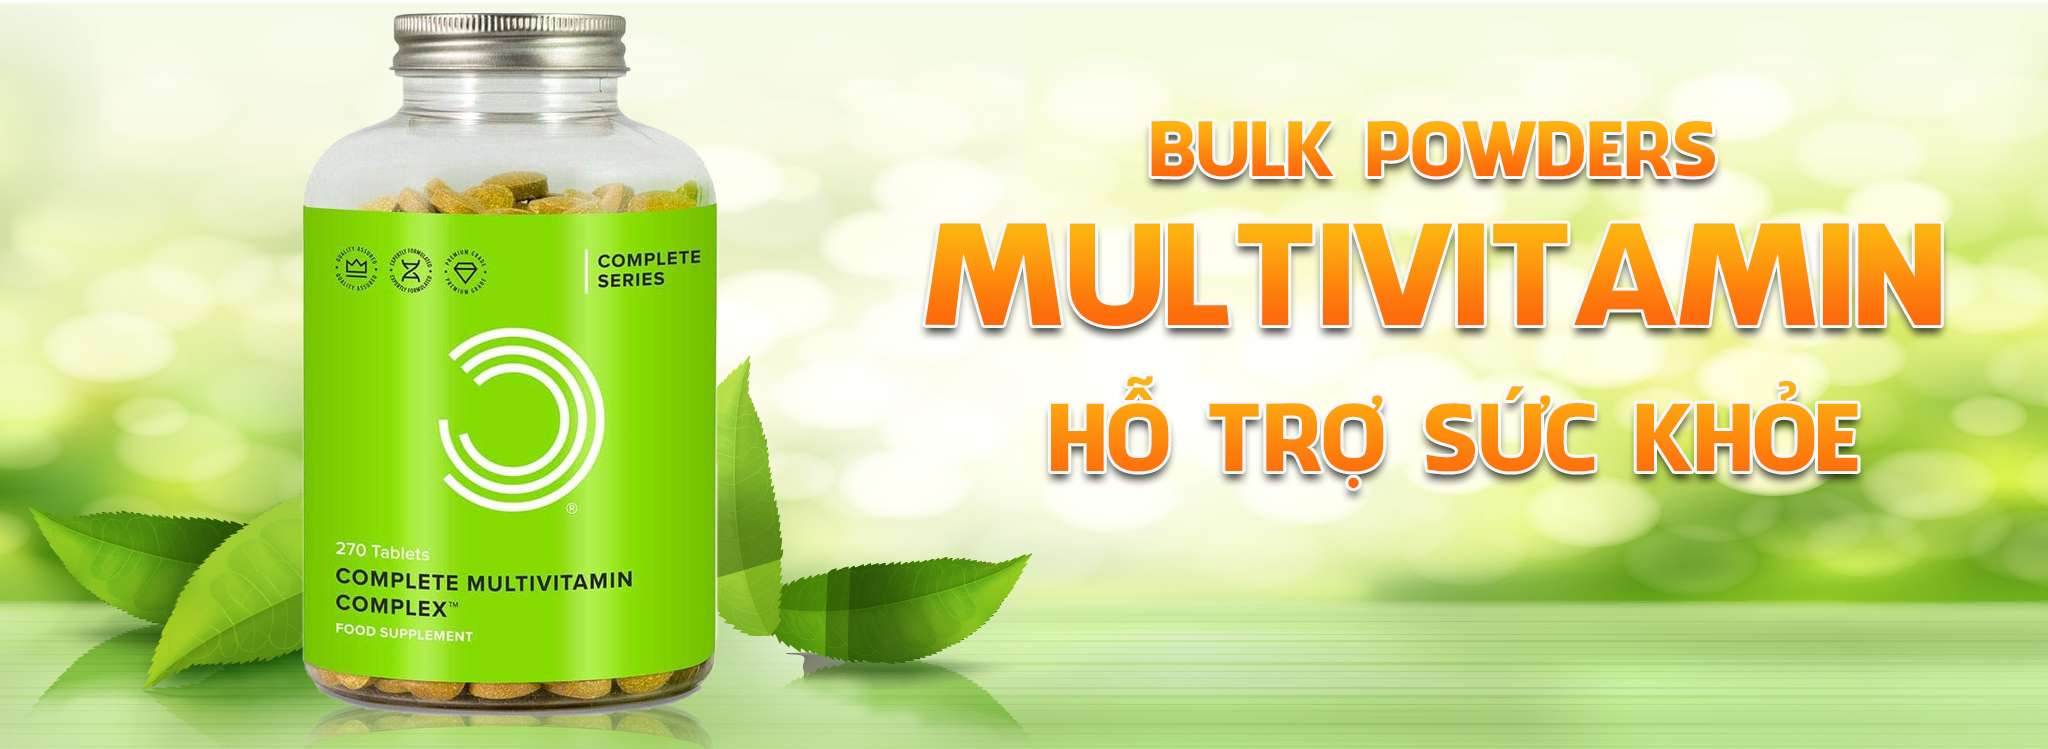 complete multivitamin ho tro suc khoe dinh duong 270 vien 1